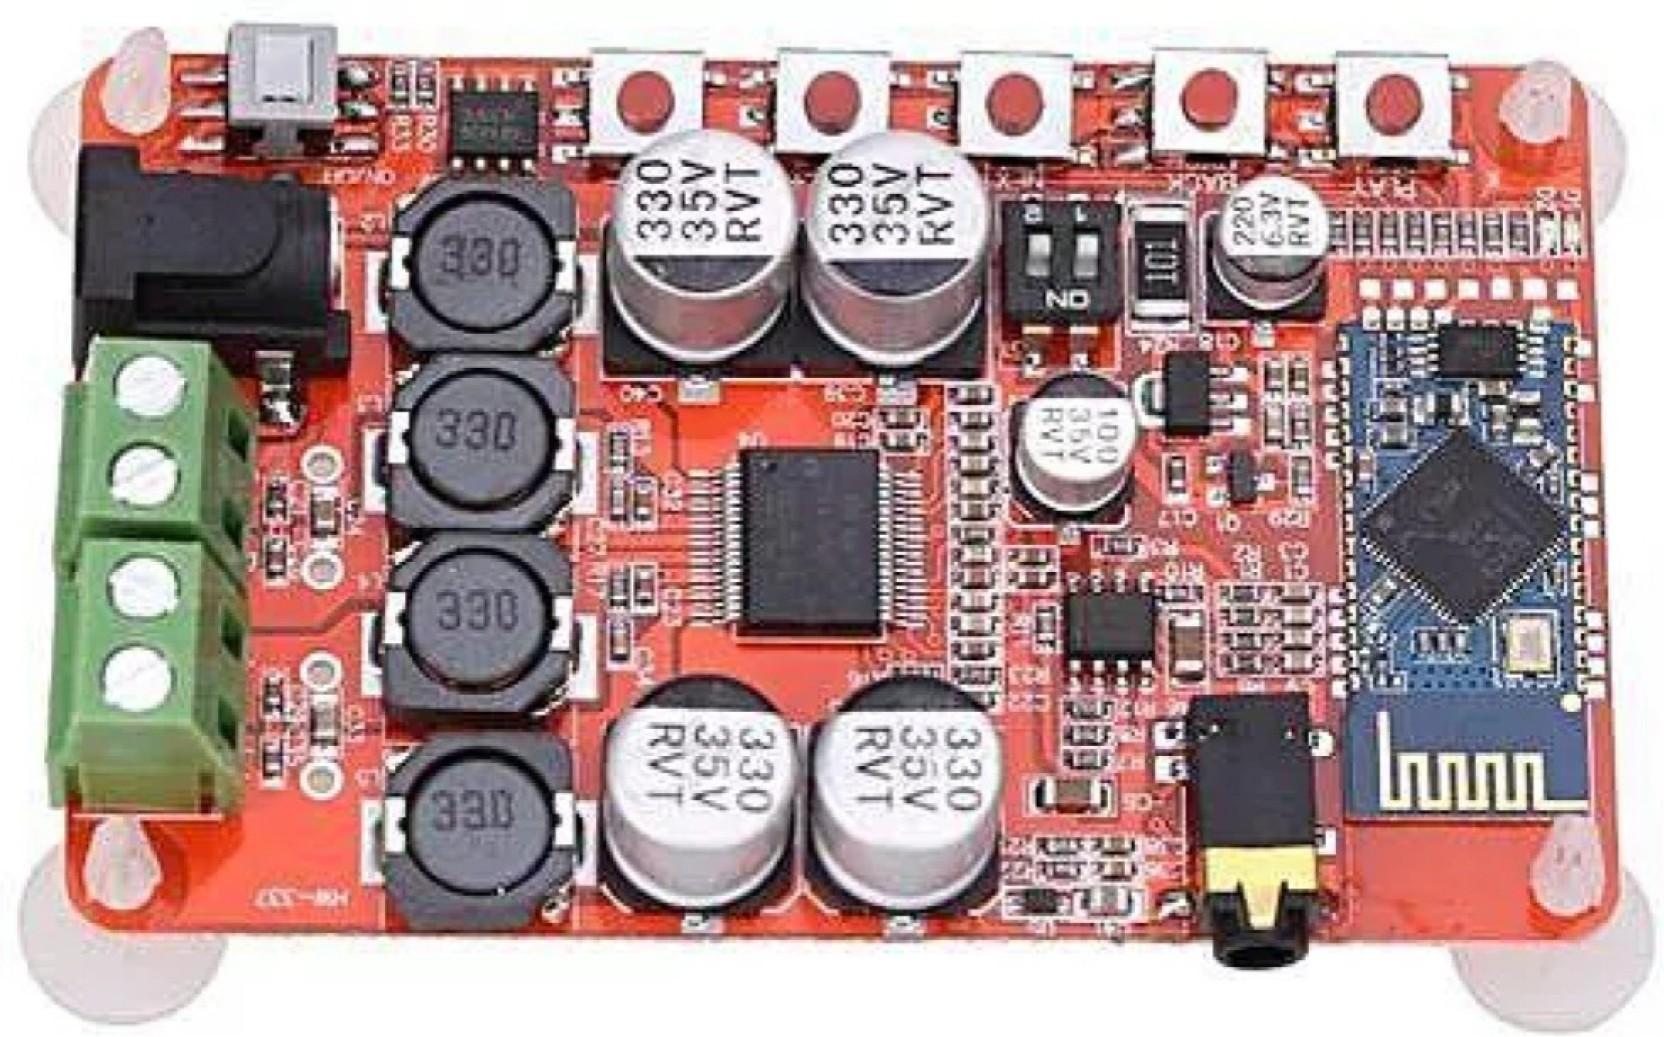 Kitsguru Tda7492p 50w Csr8635 Bluetooth 40 Audio Receiver 30w Stereo Power Amplifier Based Tda 1521 Digital Board Electronic Components Add To Cart